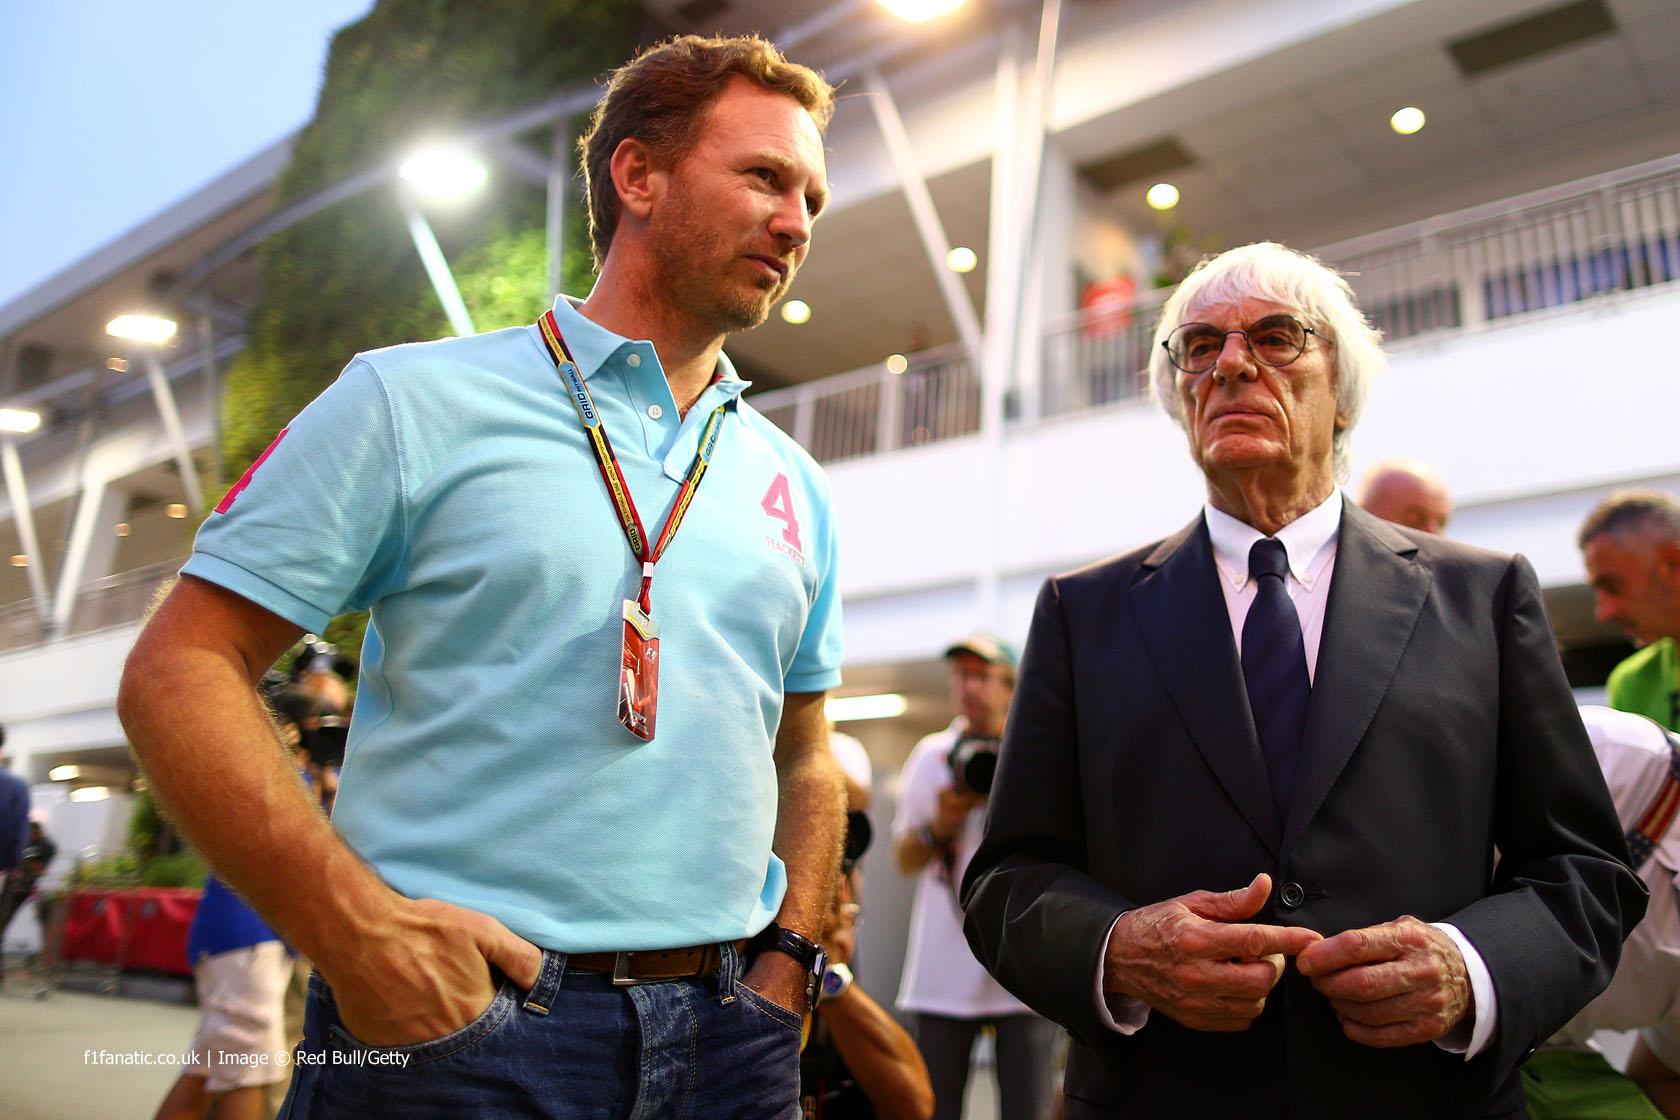 Christian Horner, Bernie Ecclestone, Singapore, 2014